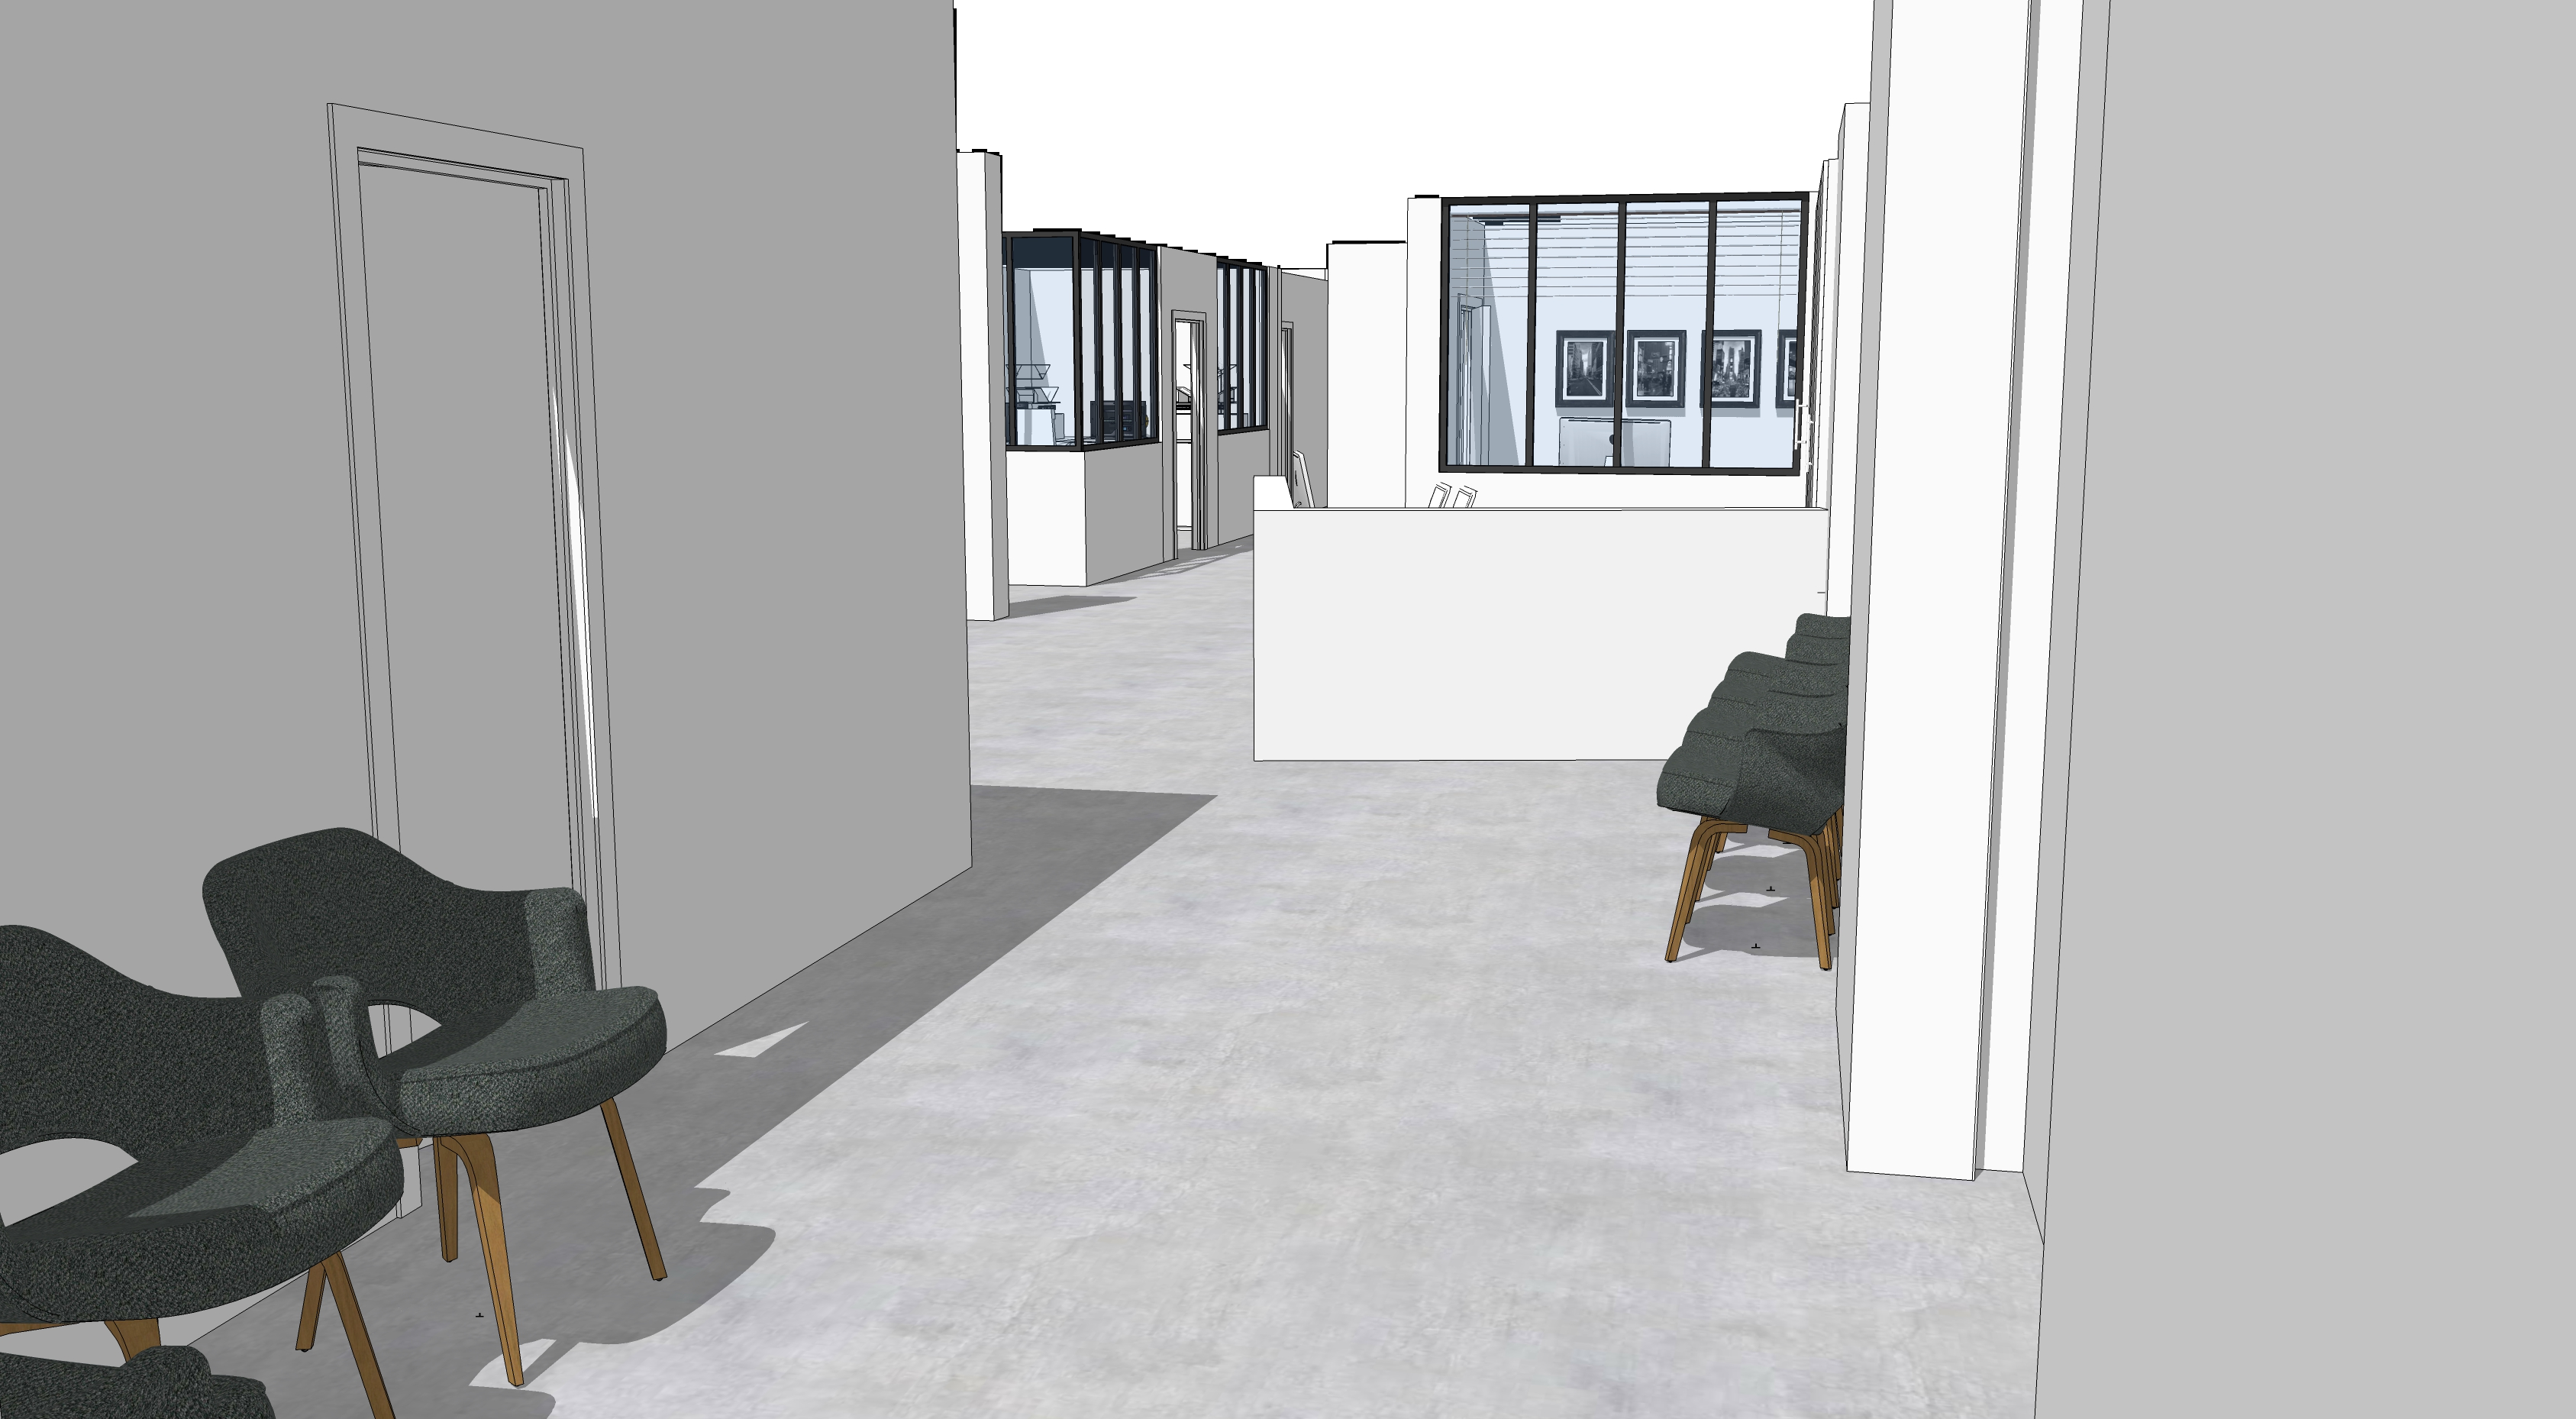 LCKPROJECTS OLIVIA LANCKSWEERT Architecture intérieur Bruxelles Brussels